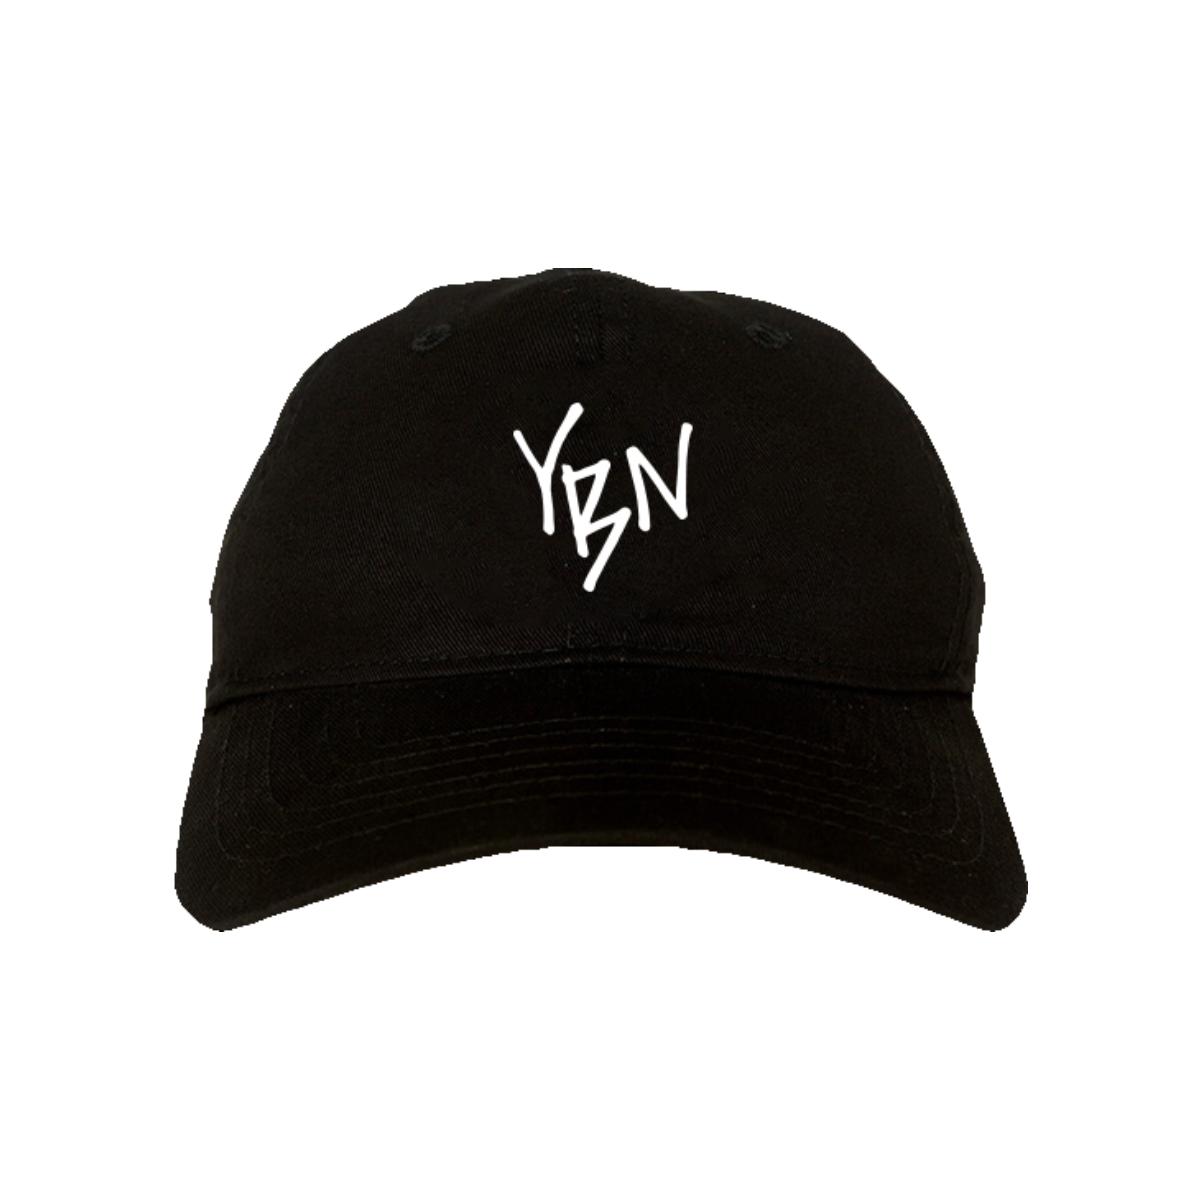 YBN Hat [Black]